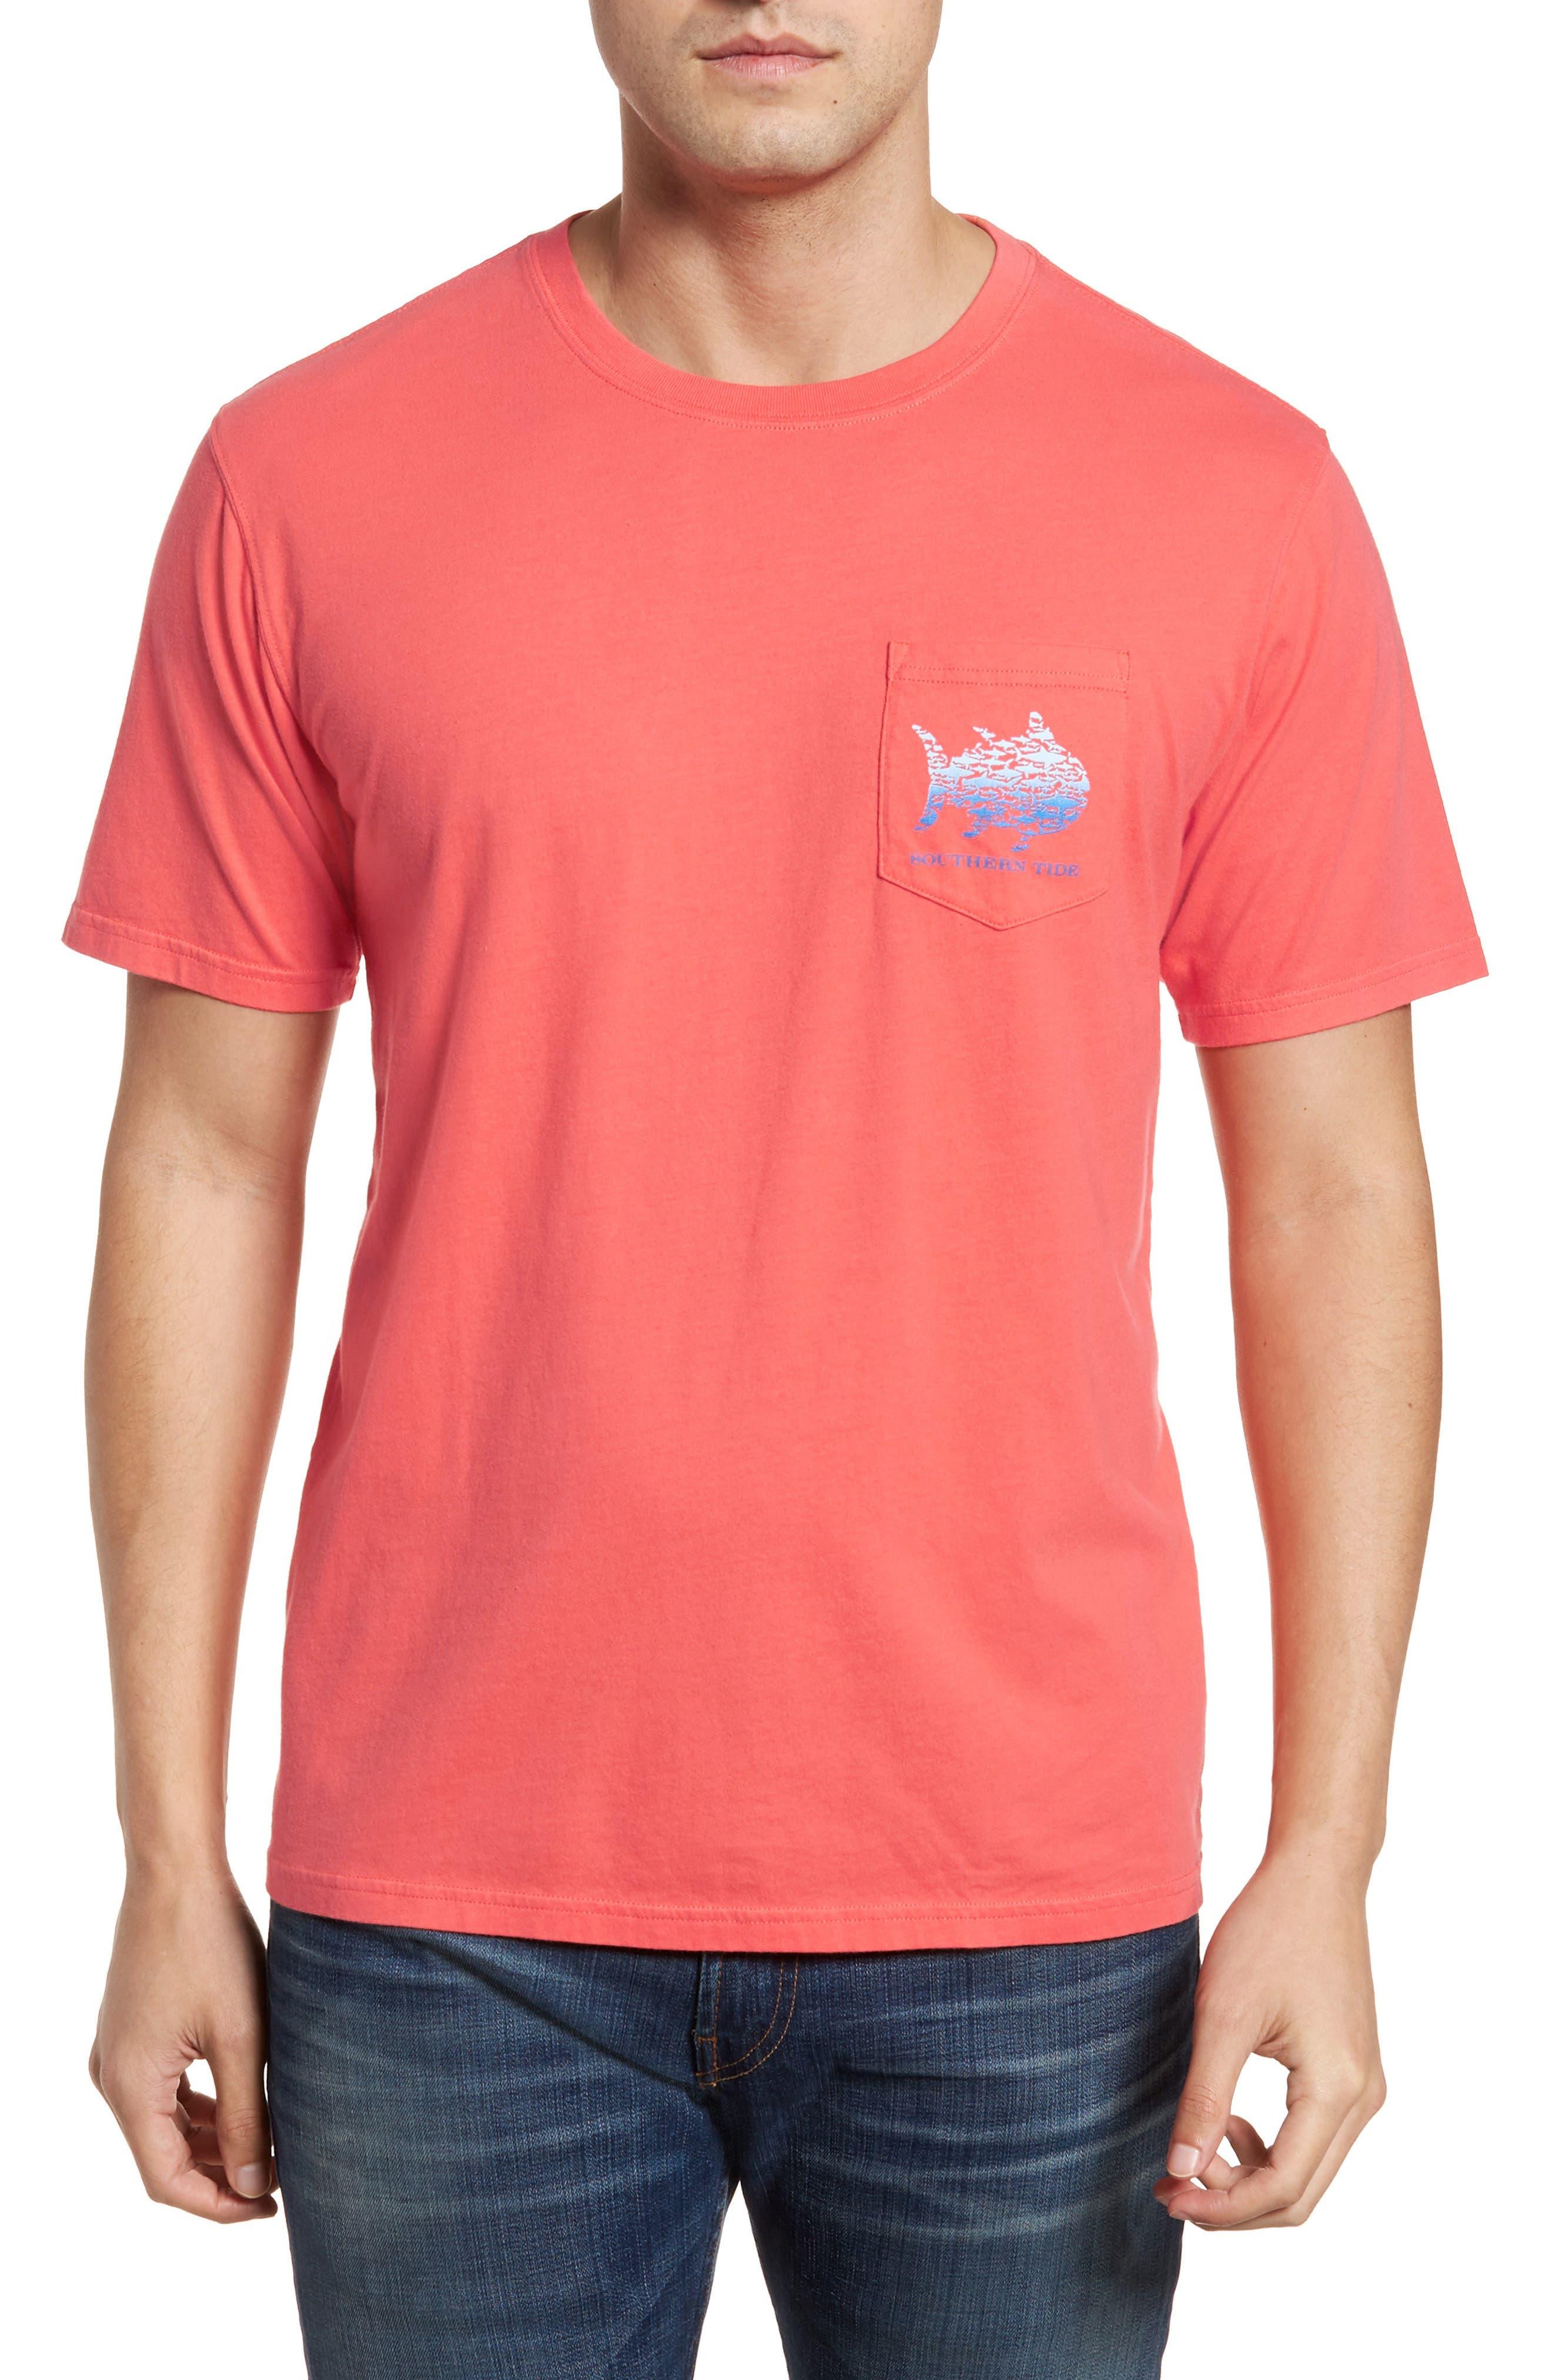 School Of Sharks Crewneck Cotton T-Shirt,                         Main,                         color, 682